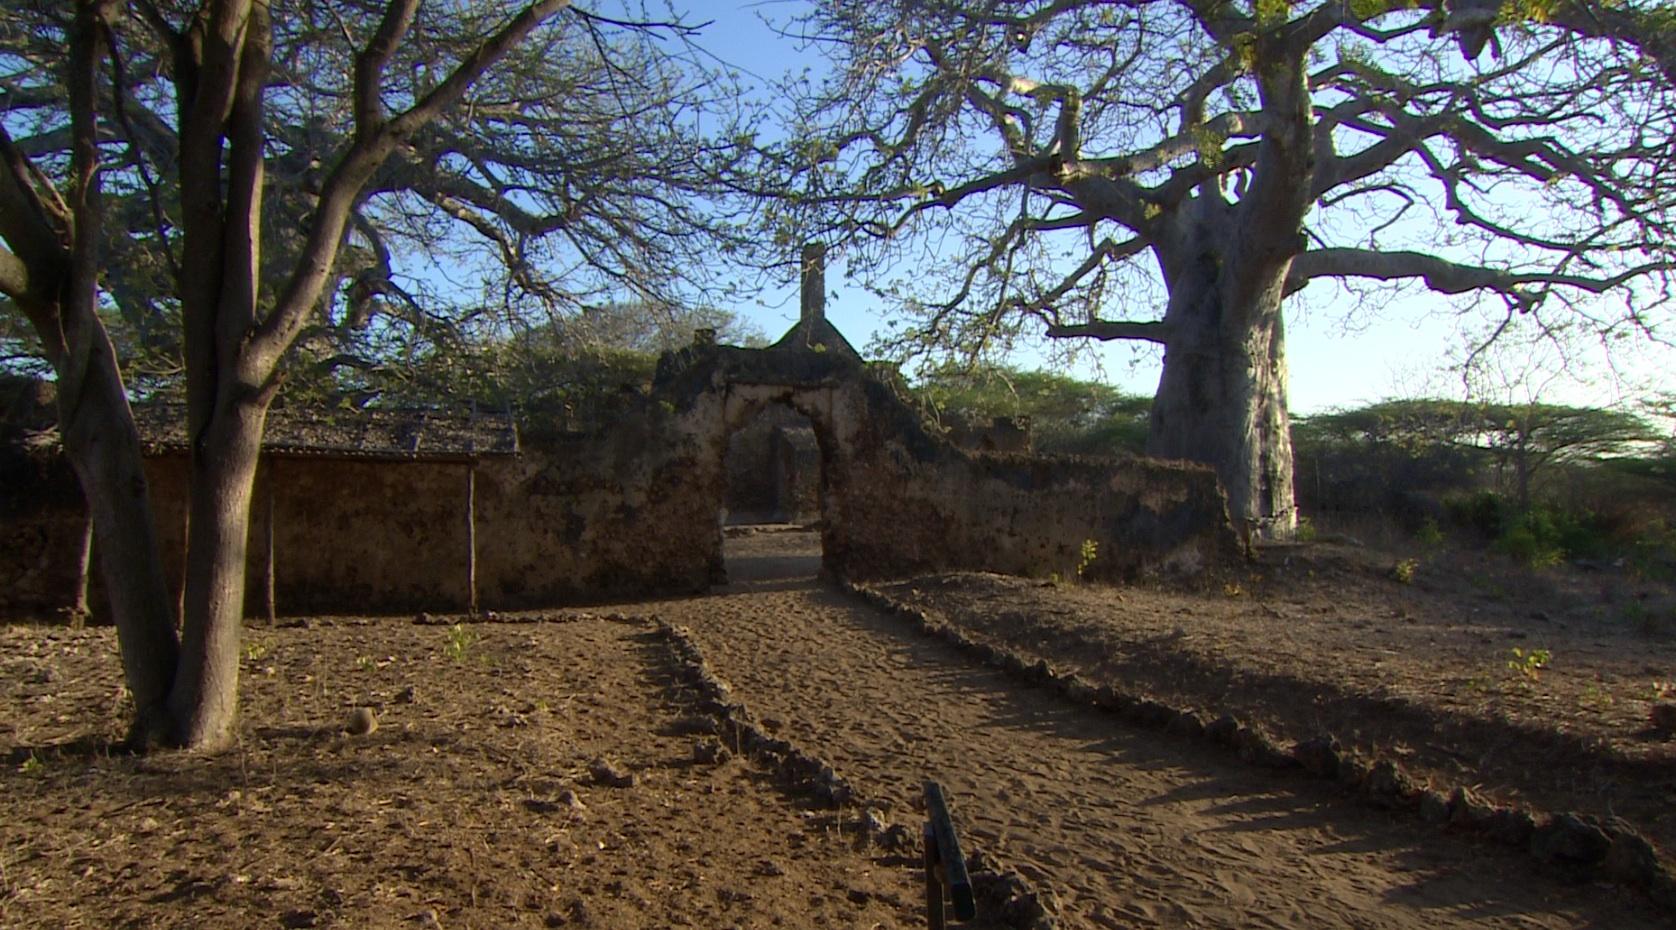 6 reasons to visit Kenya's Swahili coast | CNN Travel